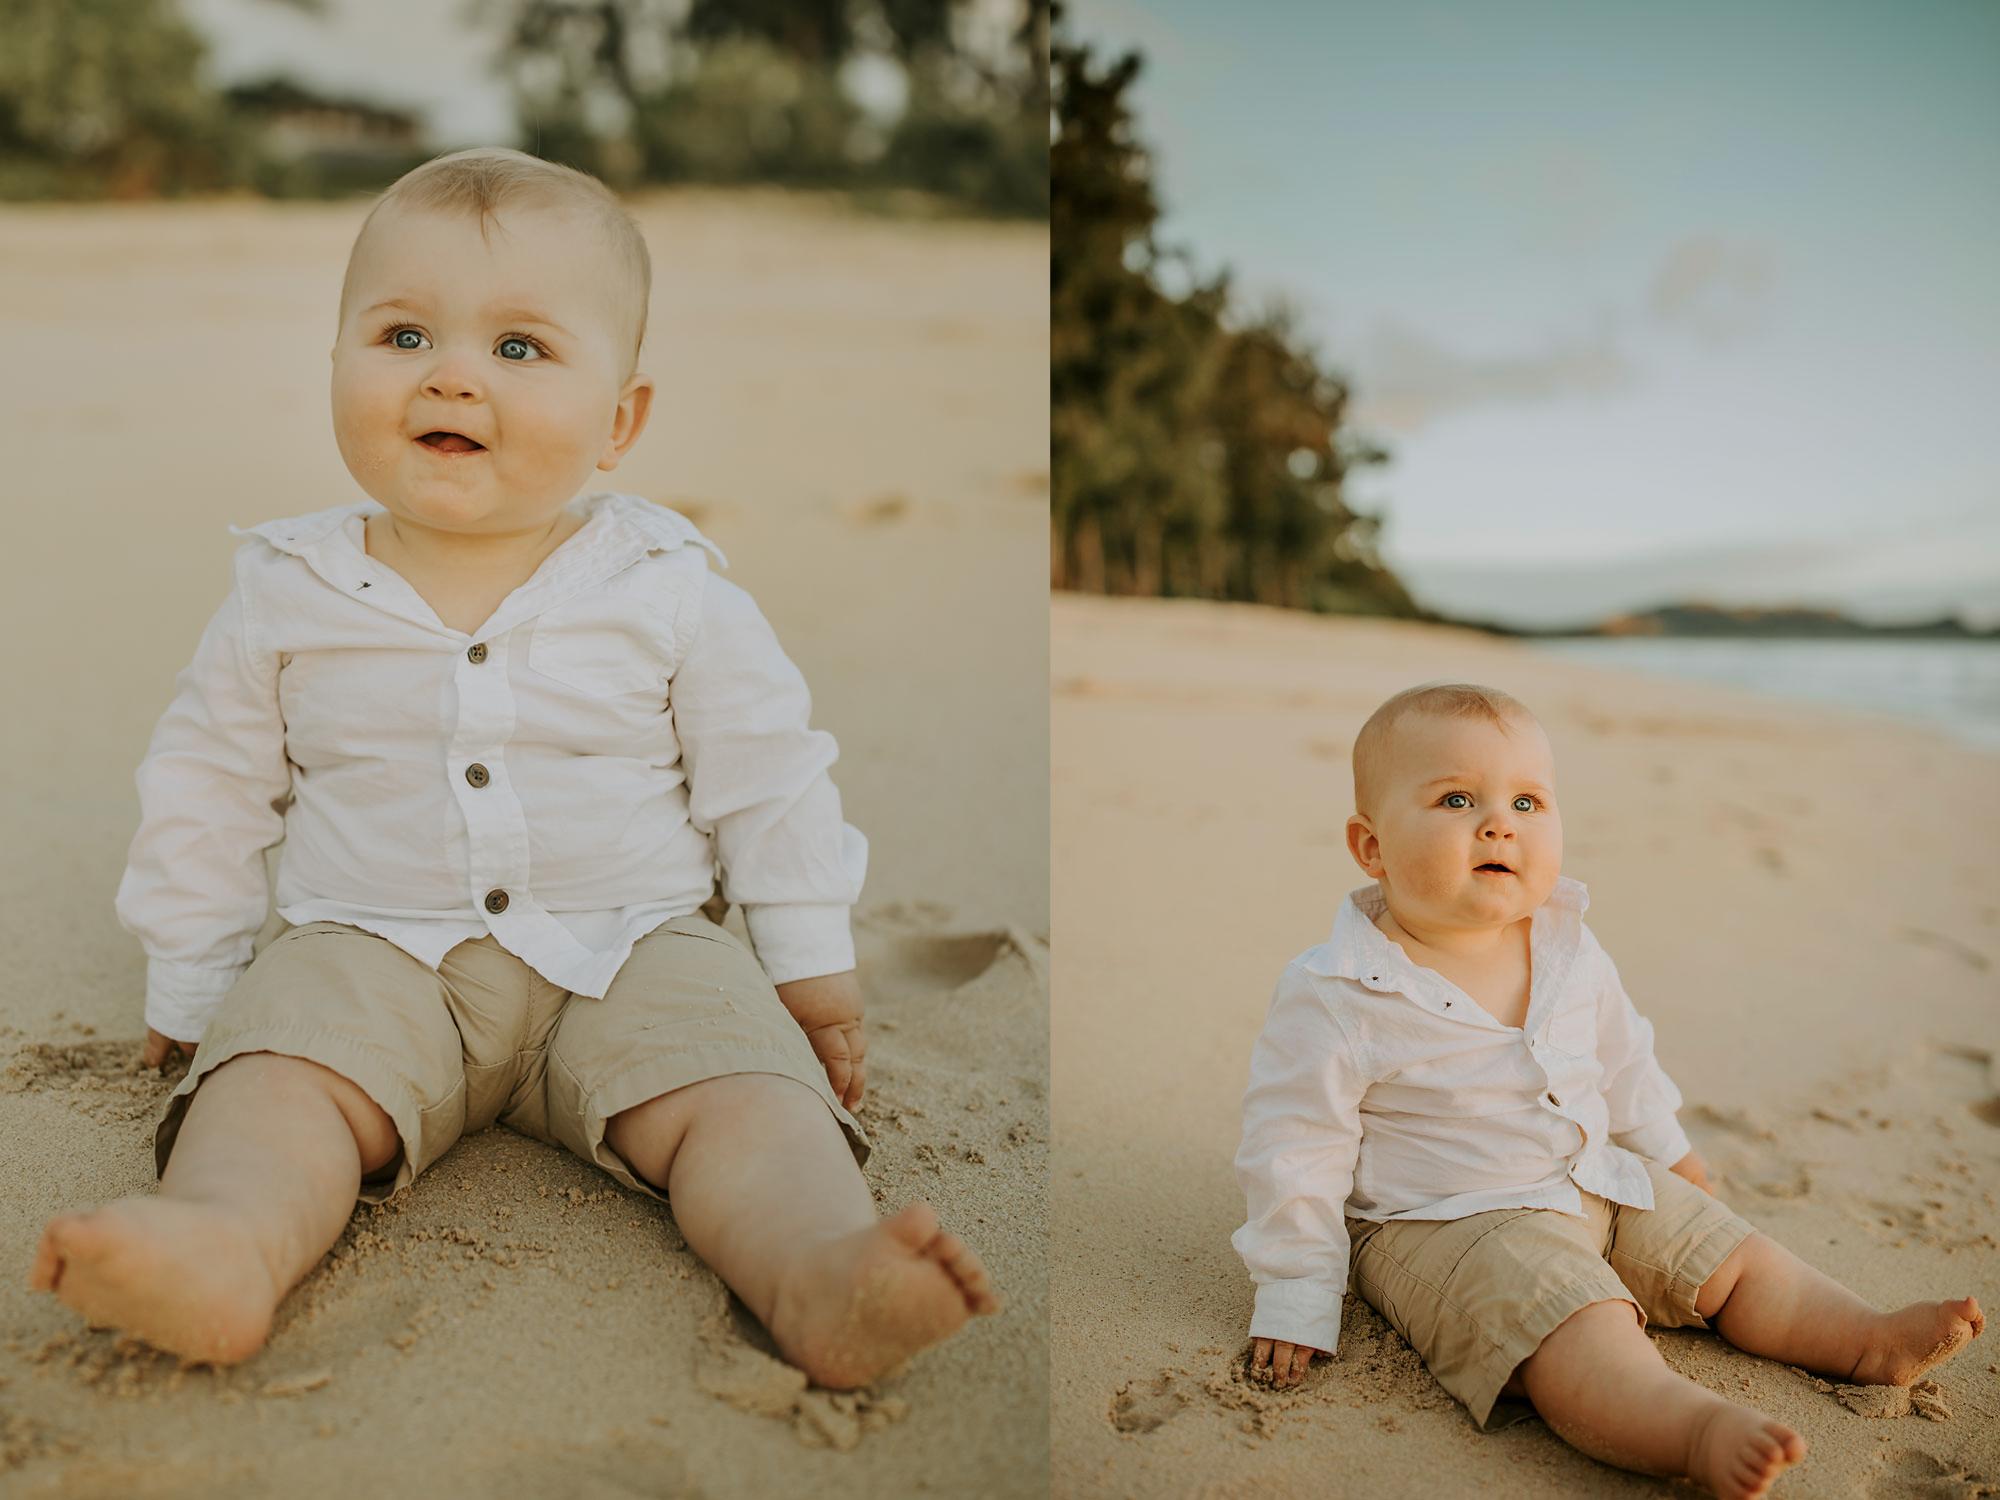 Hawaii-Oahu-Family-Photographer-08 copy.jpg